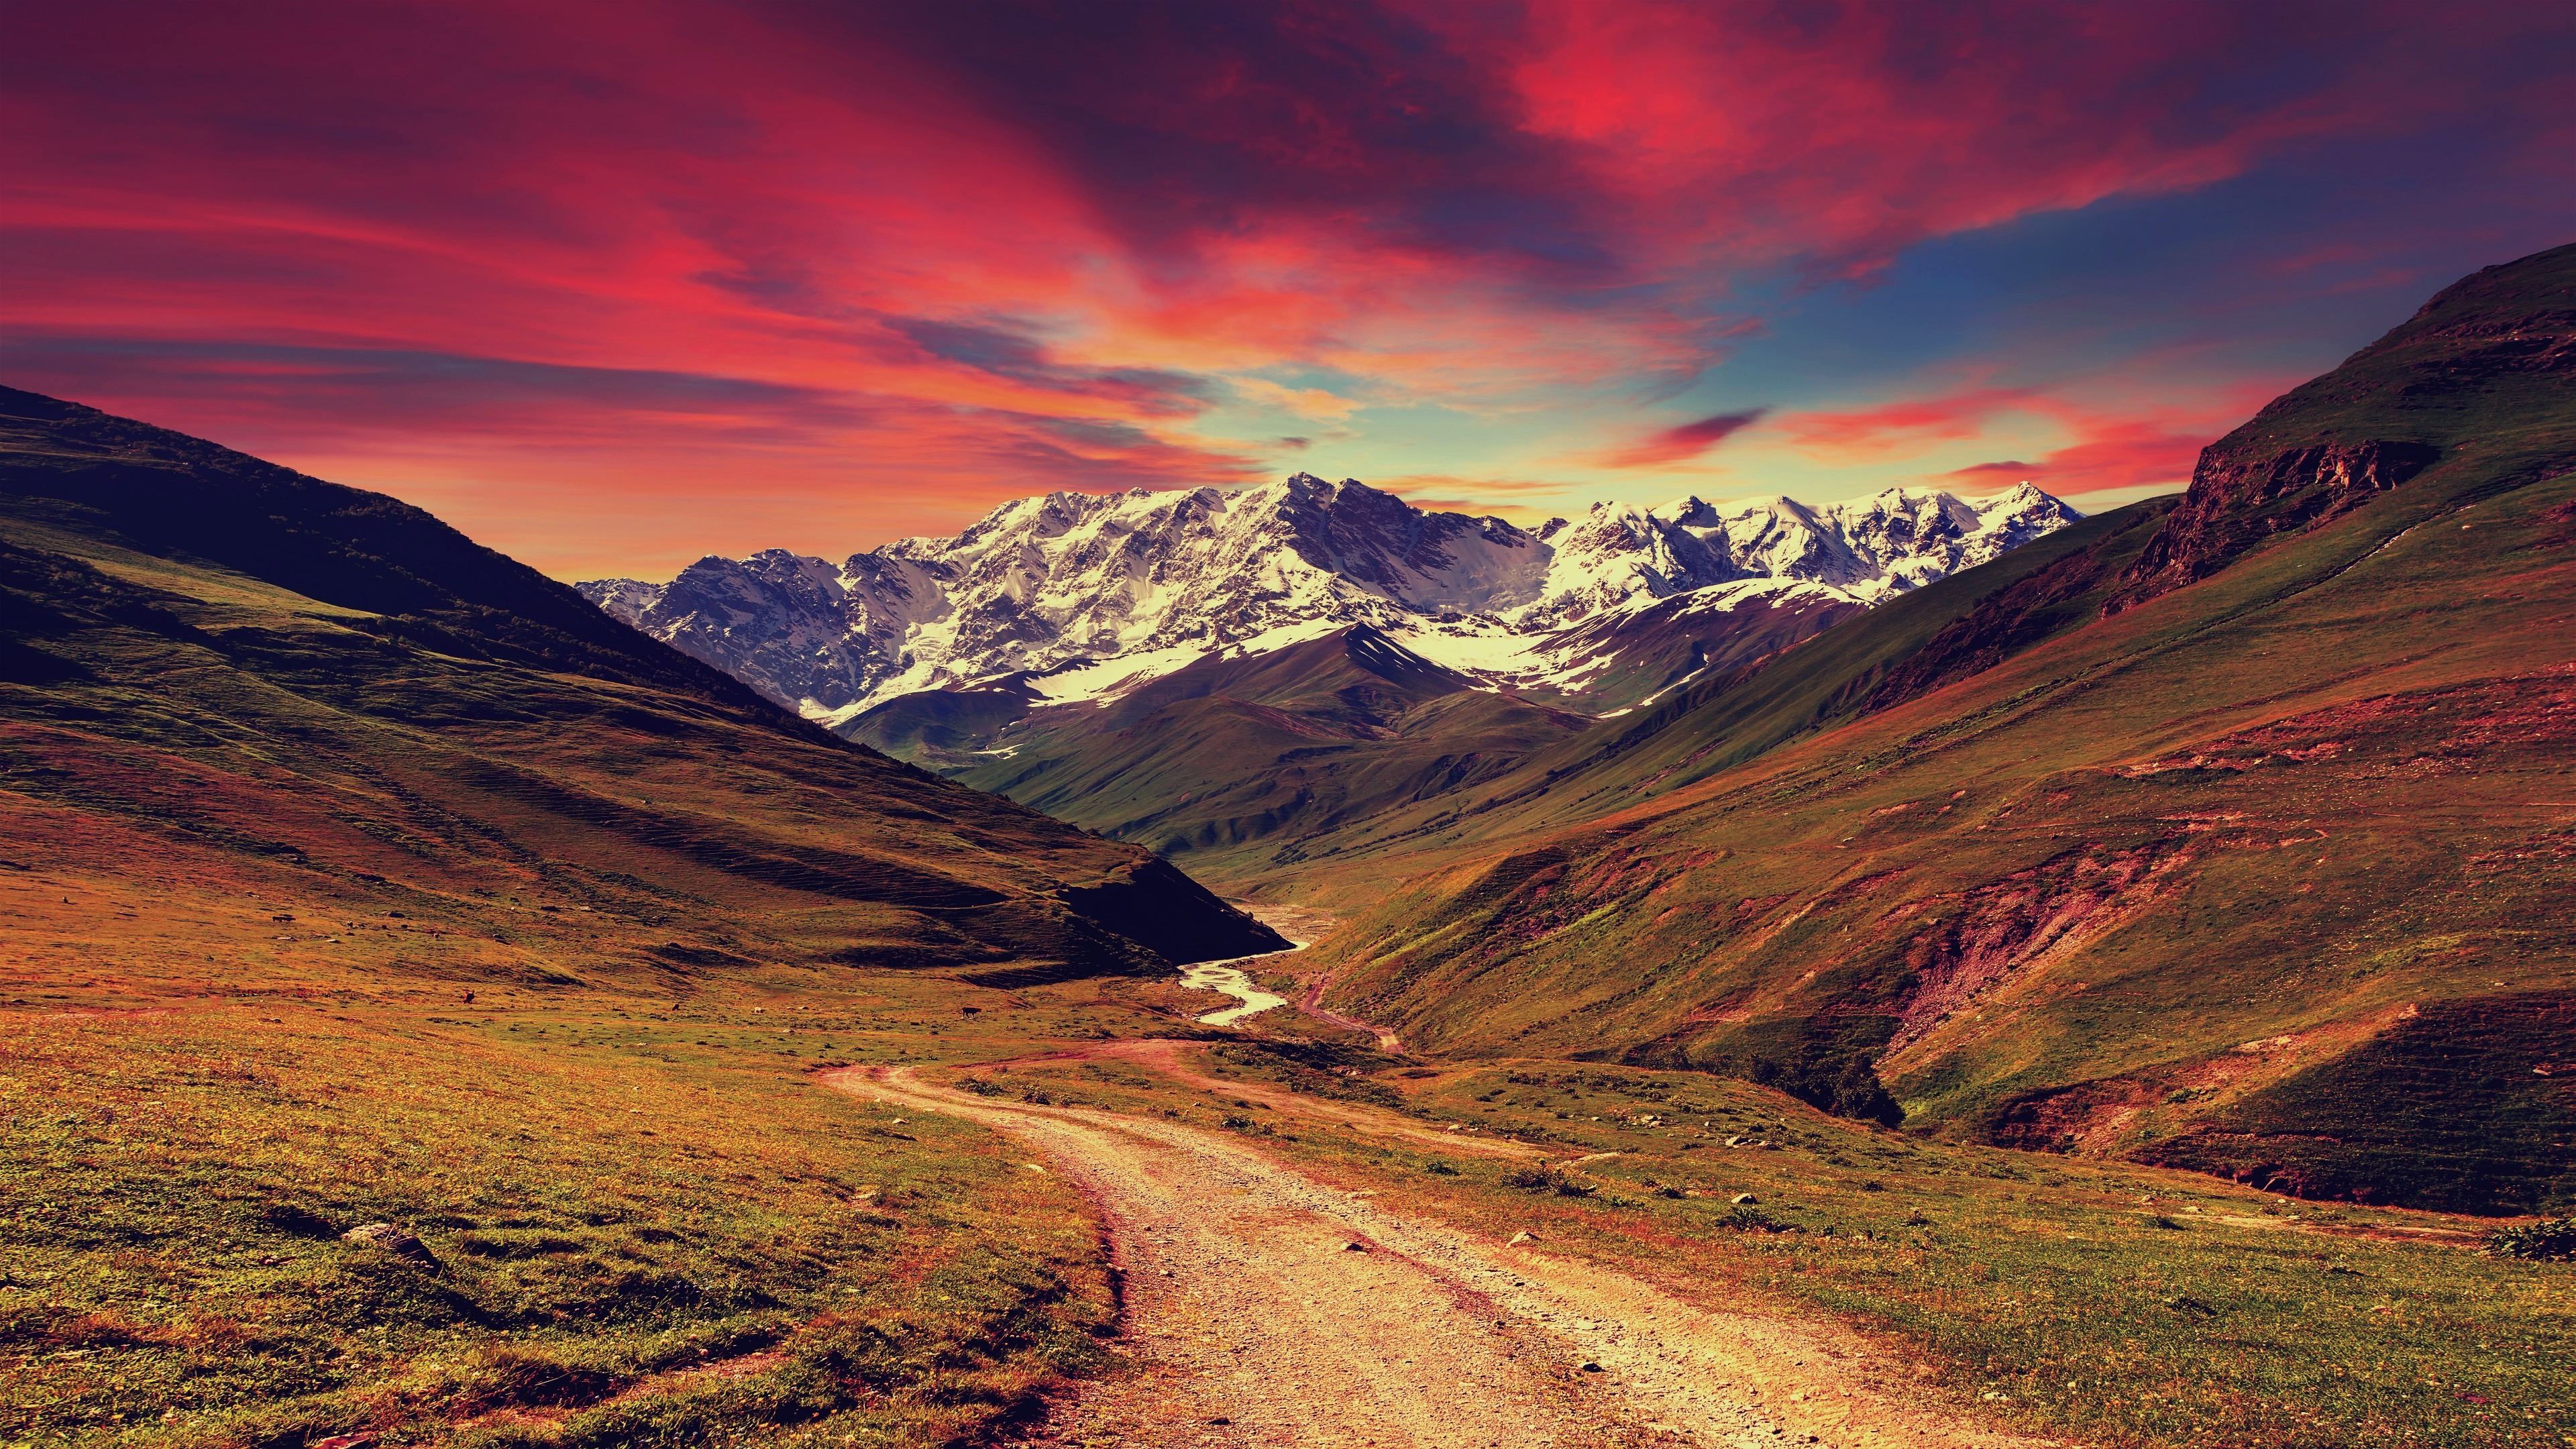 Download 3840x2160 Wallpaper Mountains Sunset Landscape 4k Uhd 16 9 Widescreen 3840x2160 Hd Image Background 990